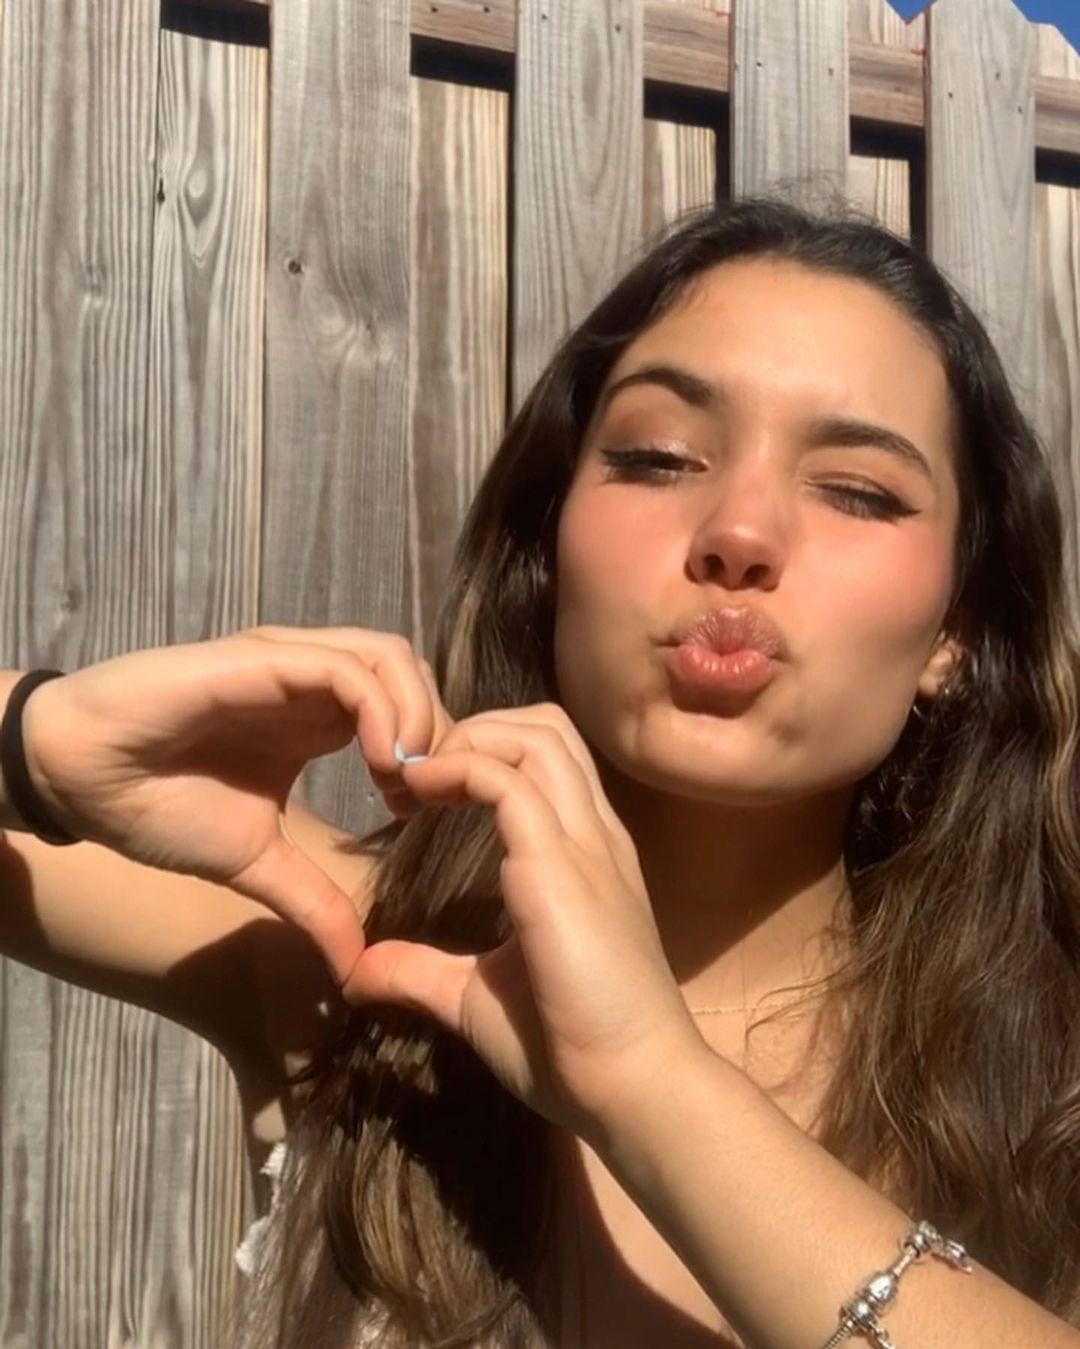 Alejandra-Olivera-Wallpapers-Insta-Fit-Bio-10